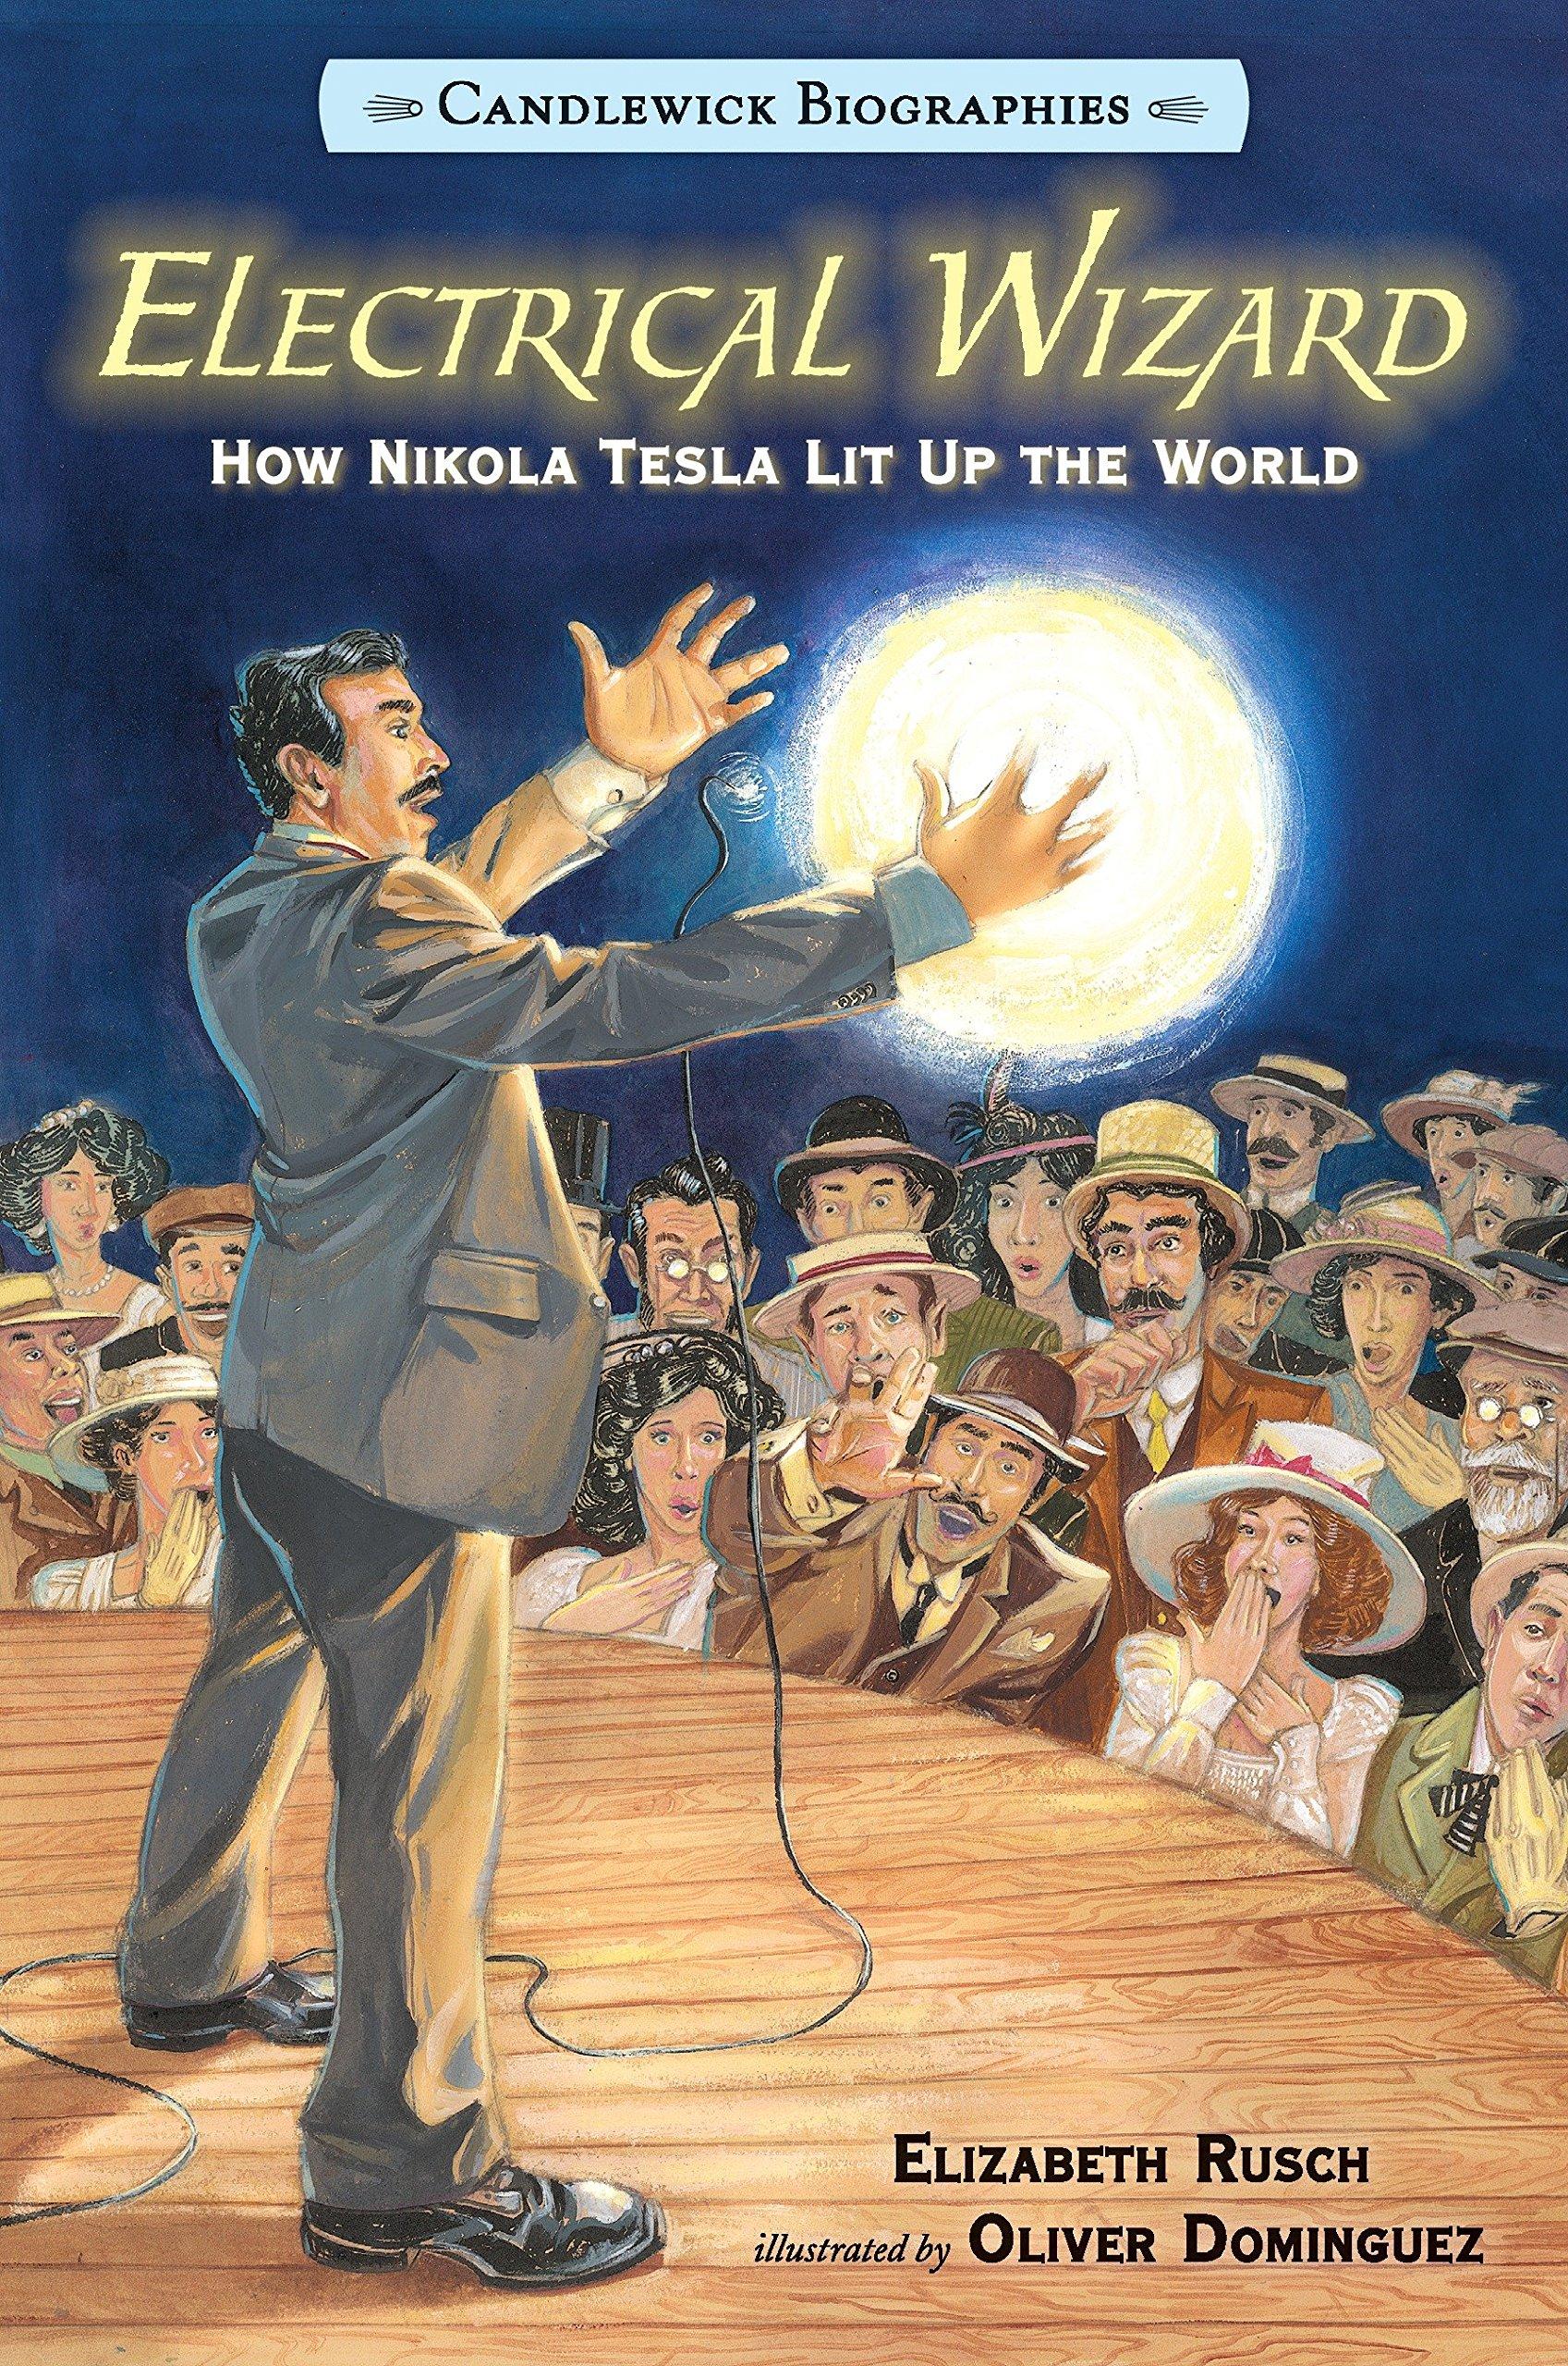 Download Electrical Wizard: Candlewick Biographies: How Nikola Tesla Lit Up the World pdf